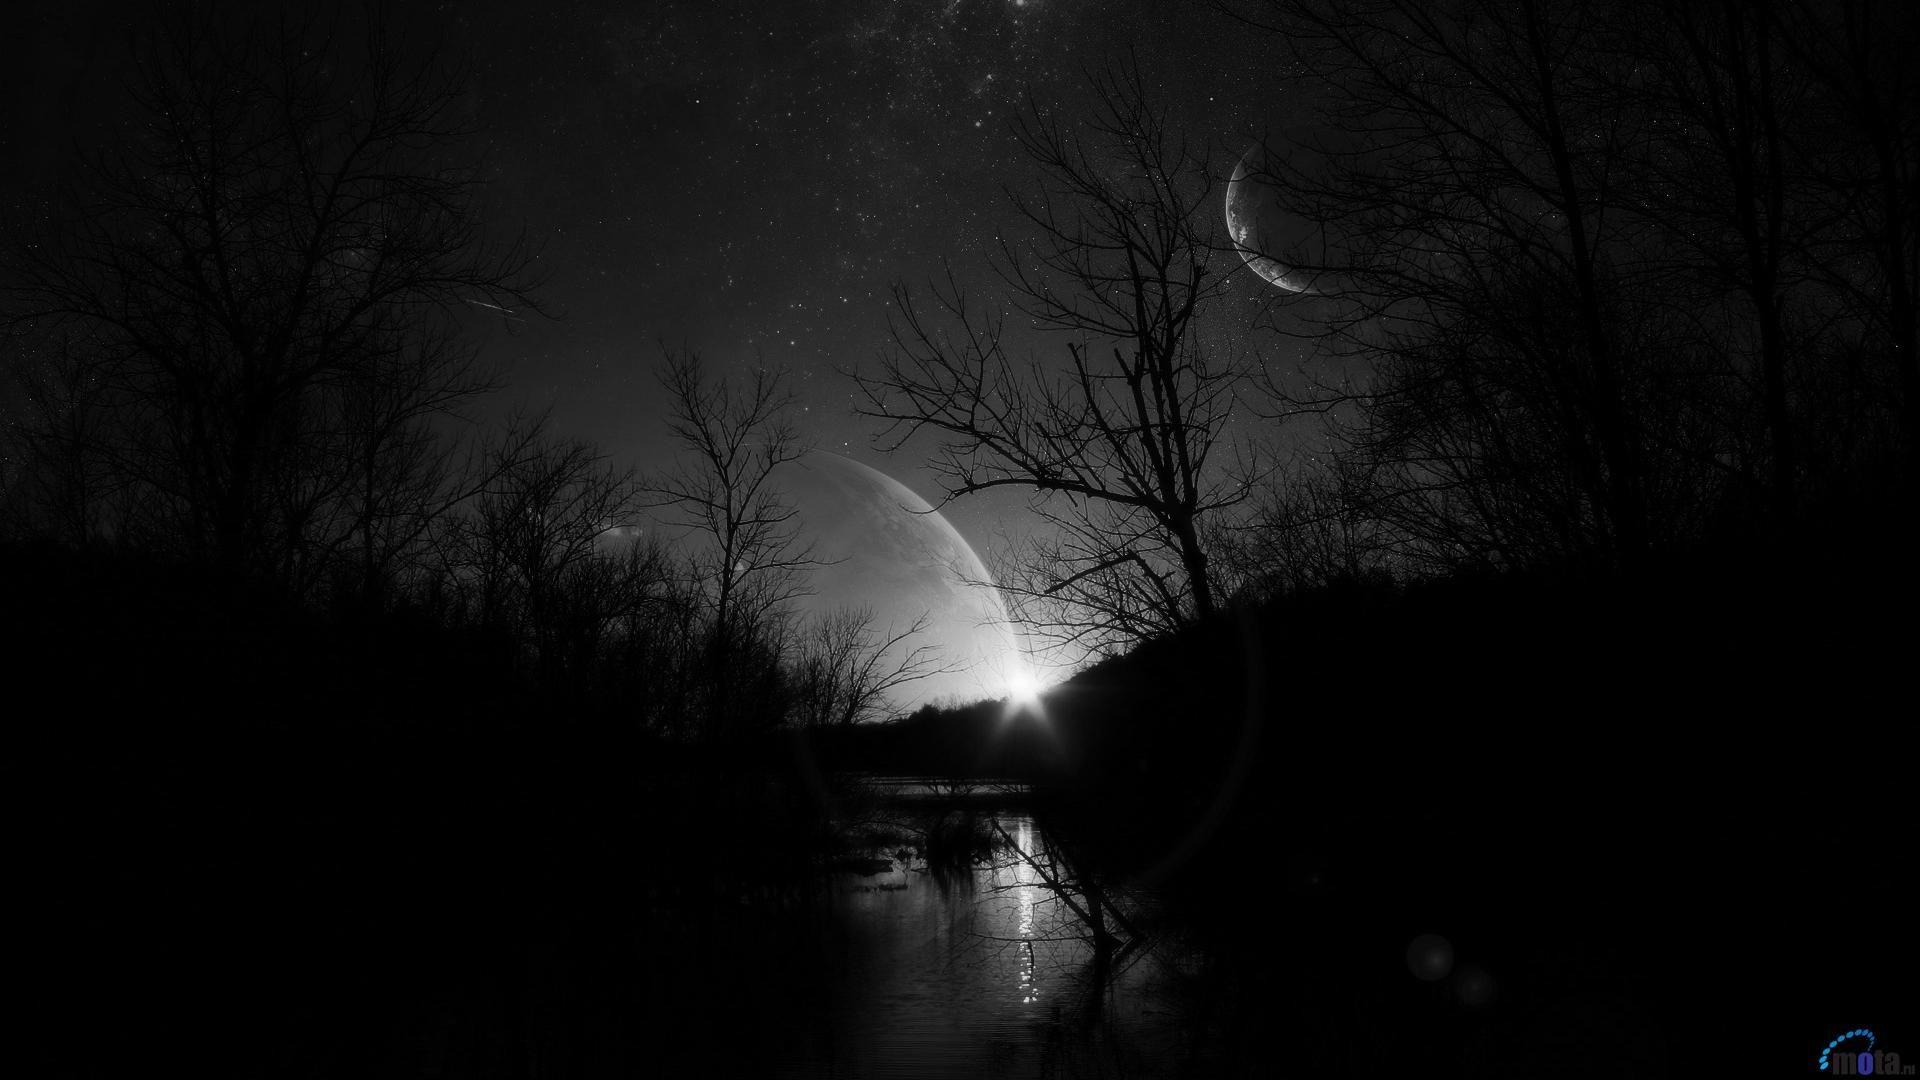 Res: 1920x1080, Download Wallpaper Starry sky dark at night (1920 x 1080 HDTV .